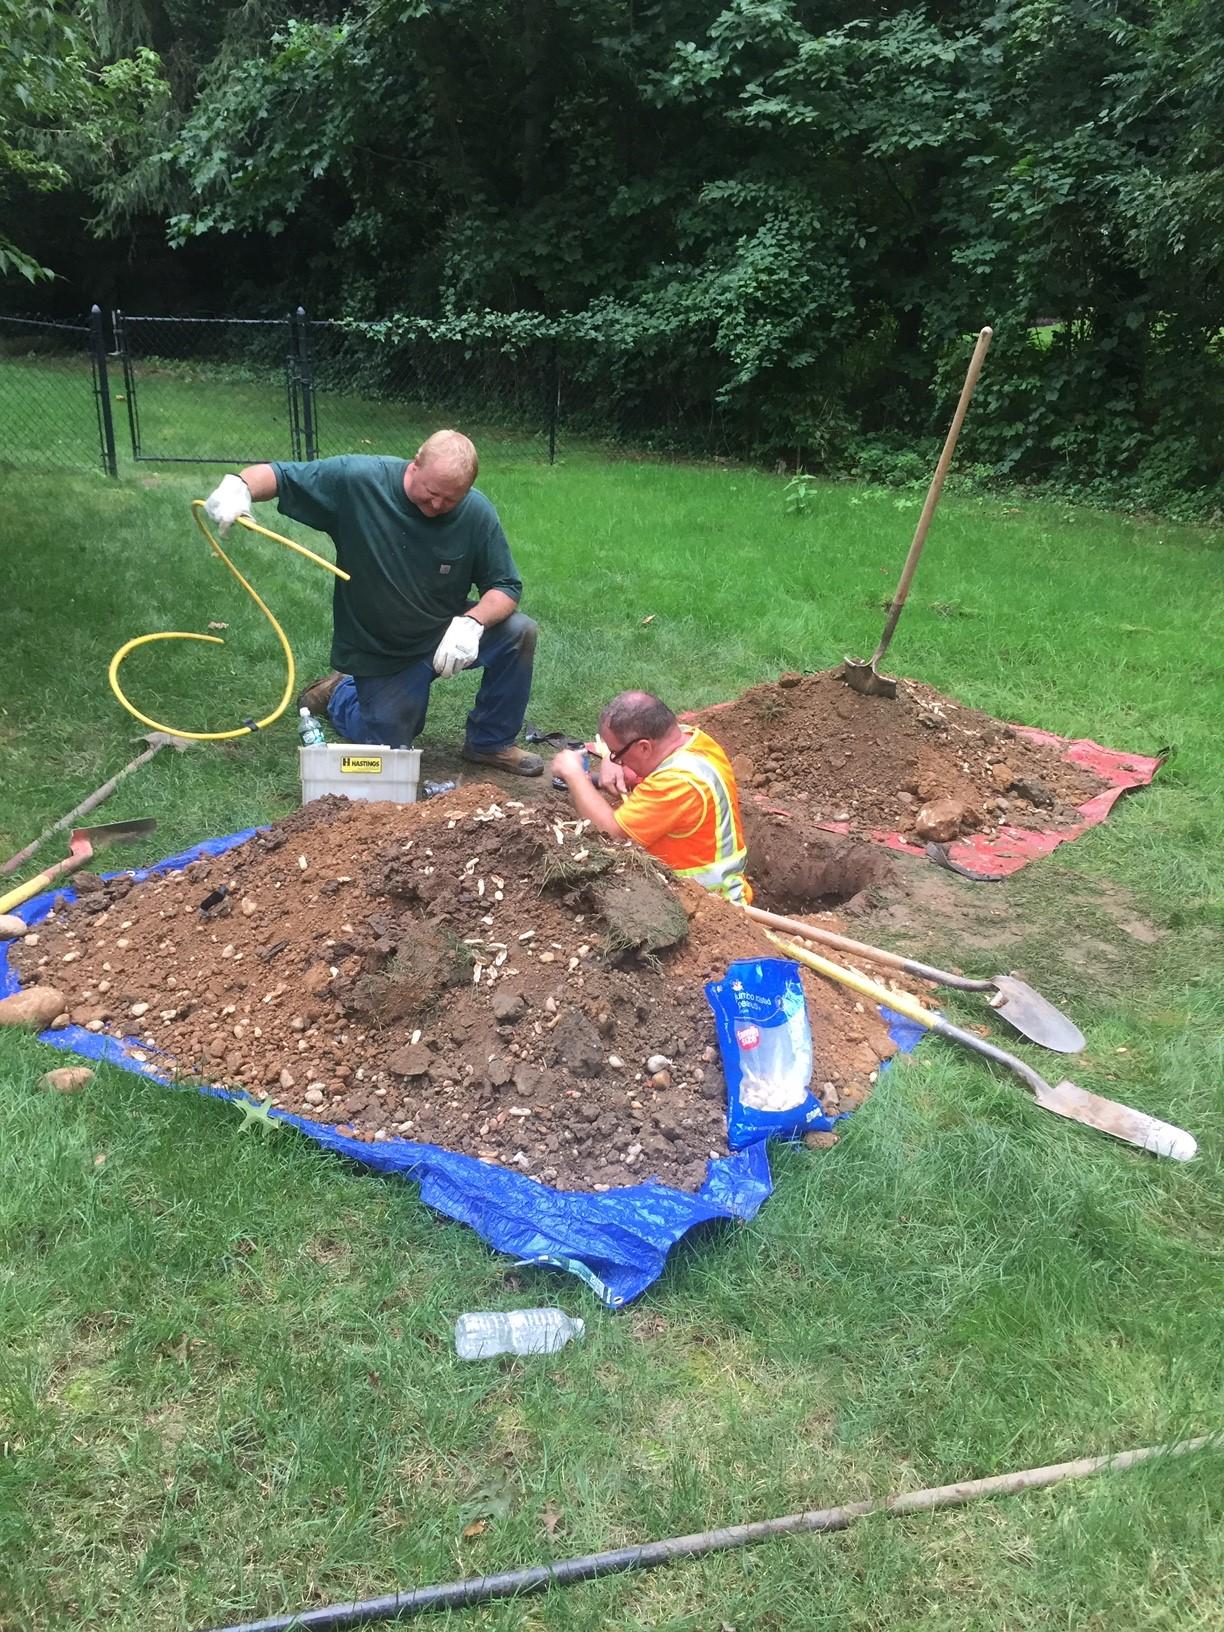 Underground Service Repair hole